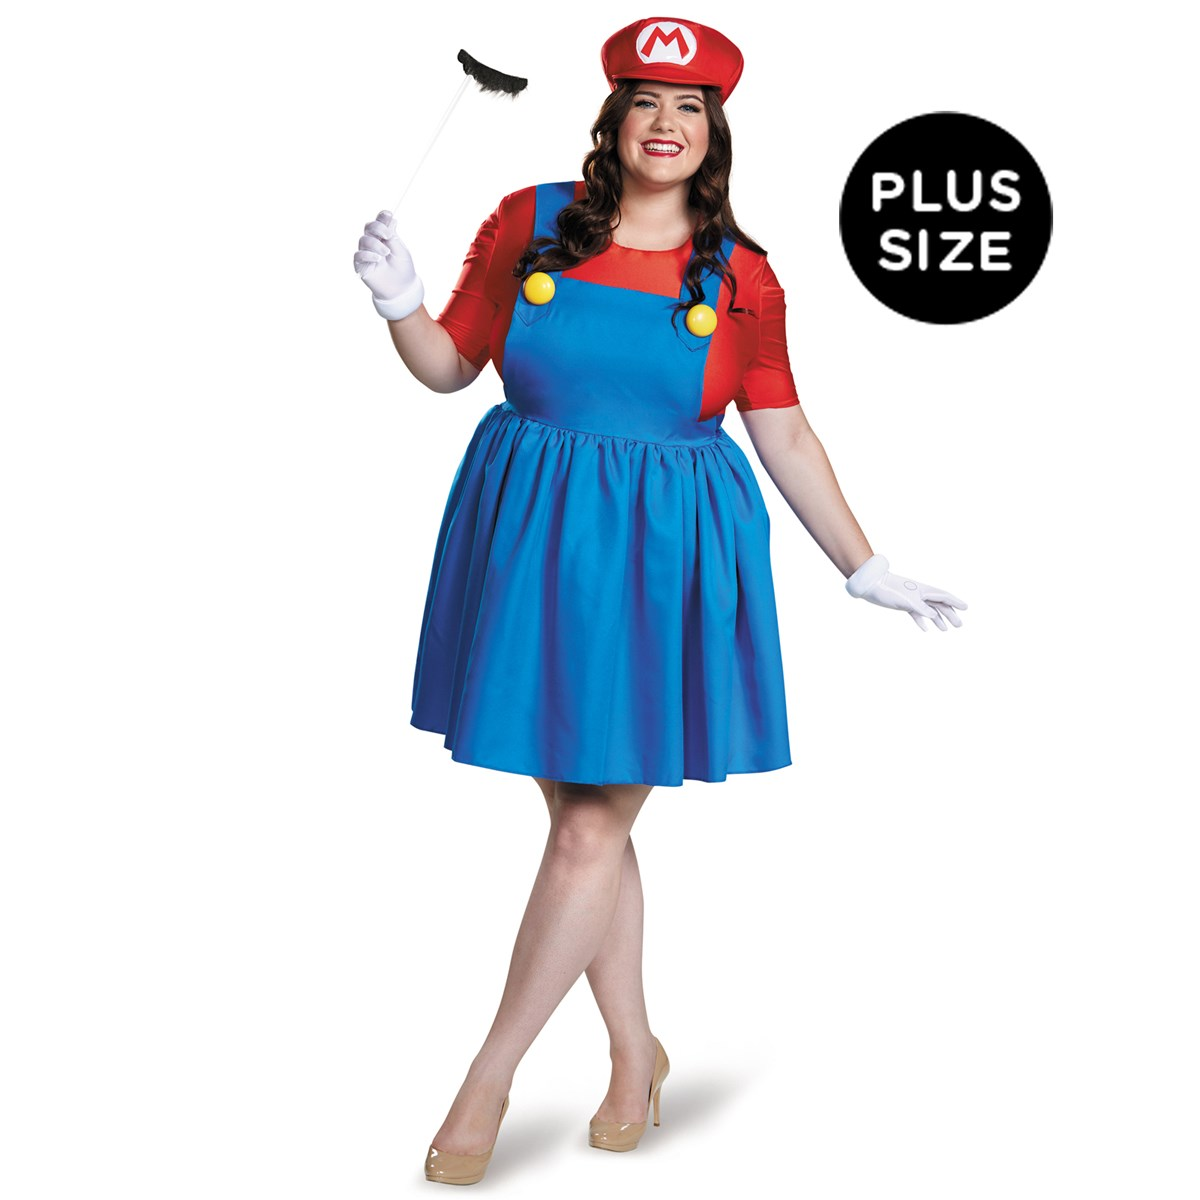 super mario plus size mario costume wskirt for women buycostumescom - Girl Mario And Luigi Halloween Costumes